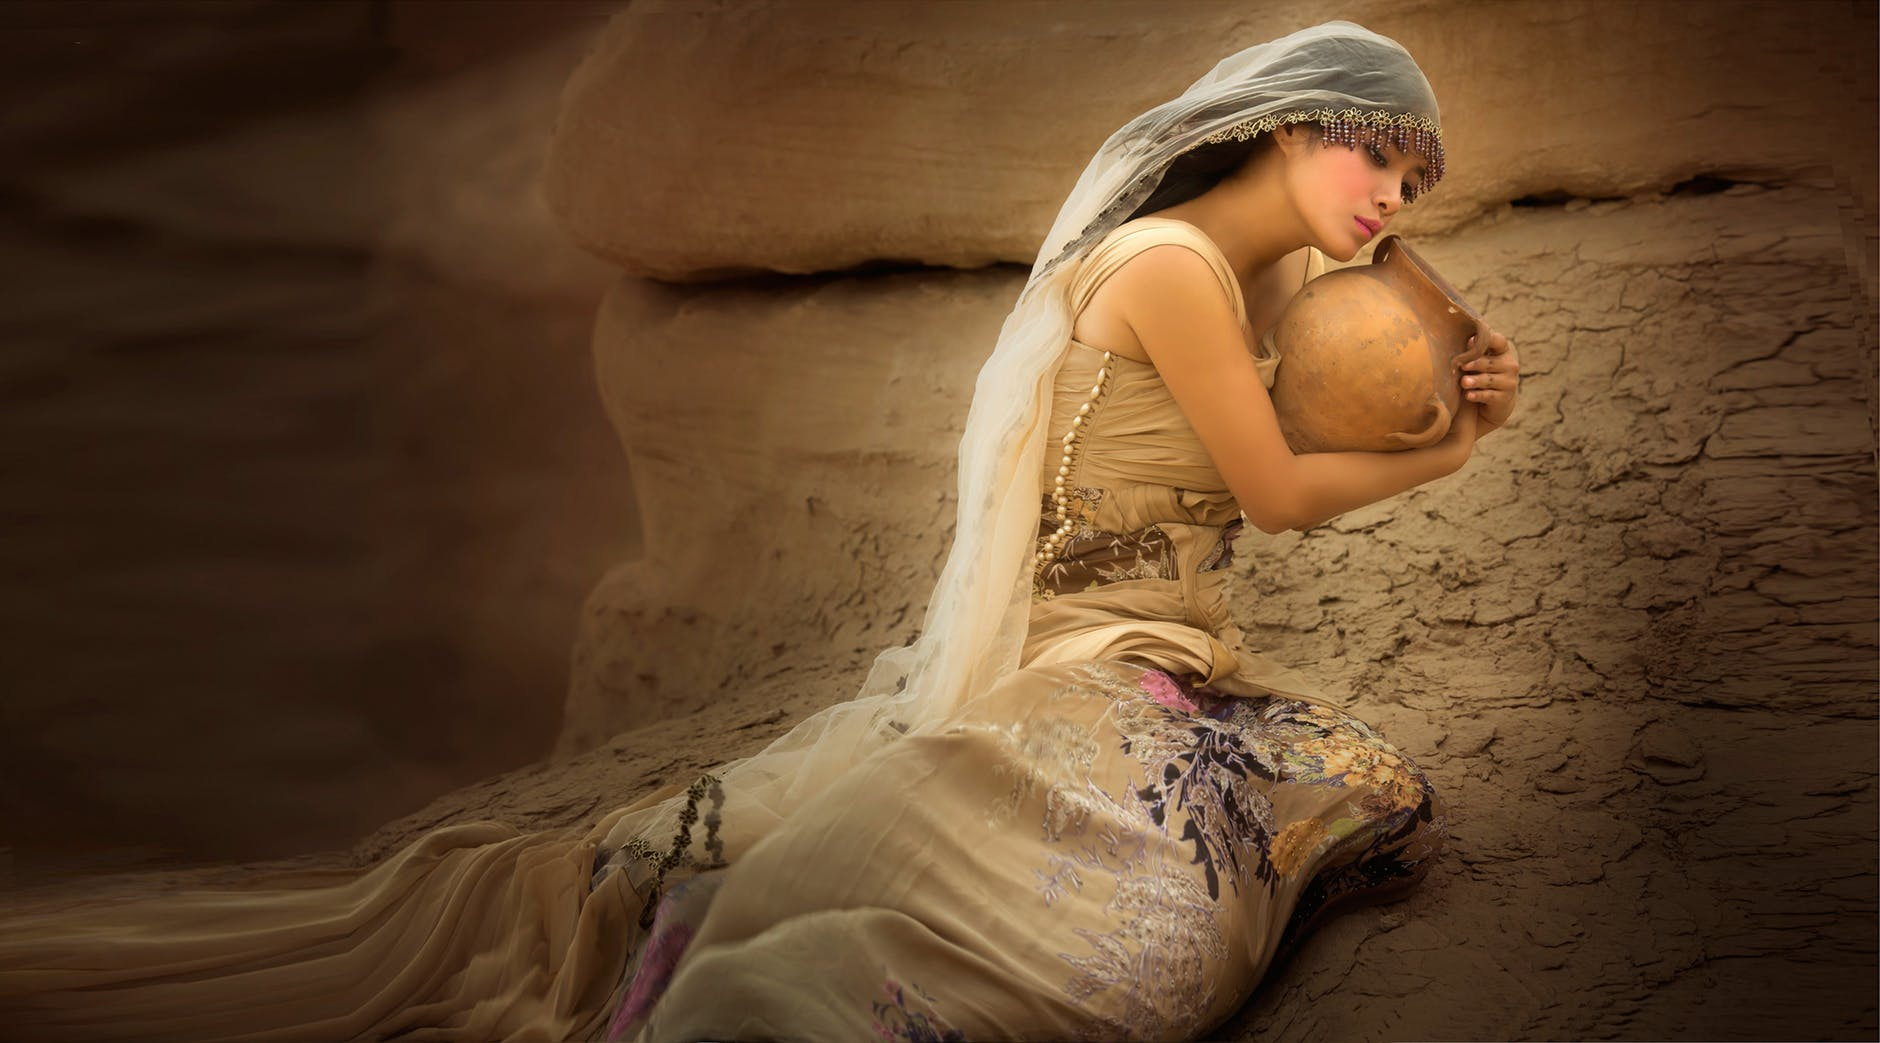 godly woman 911 - hannah barren